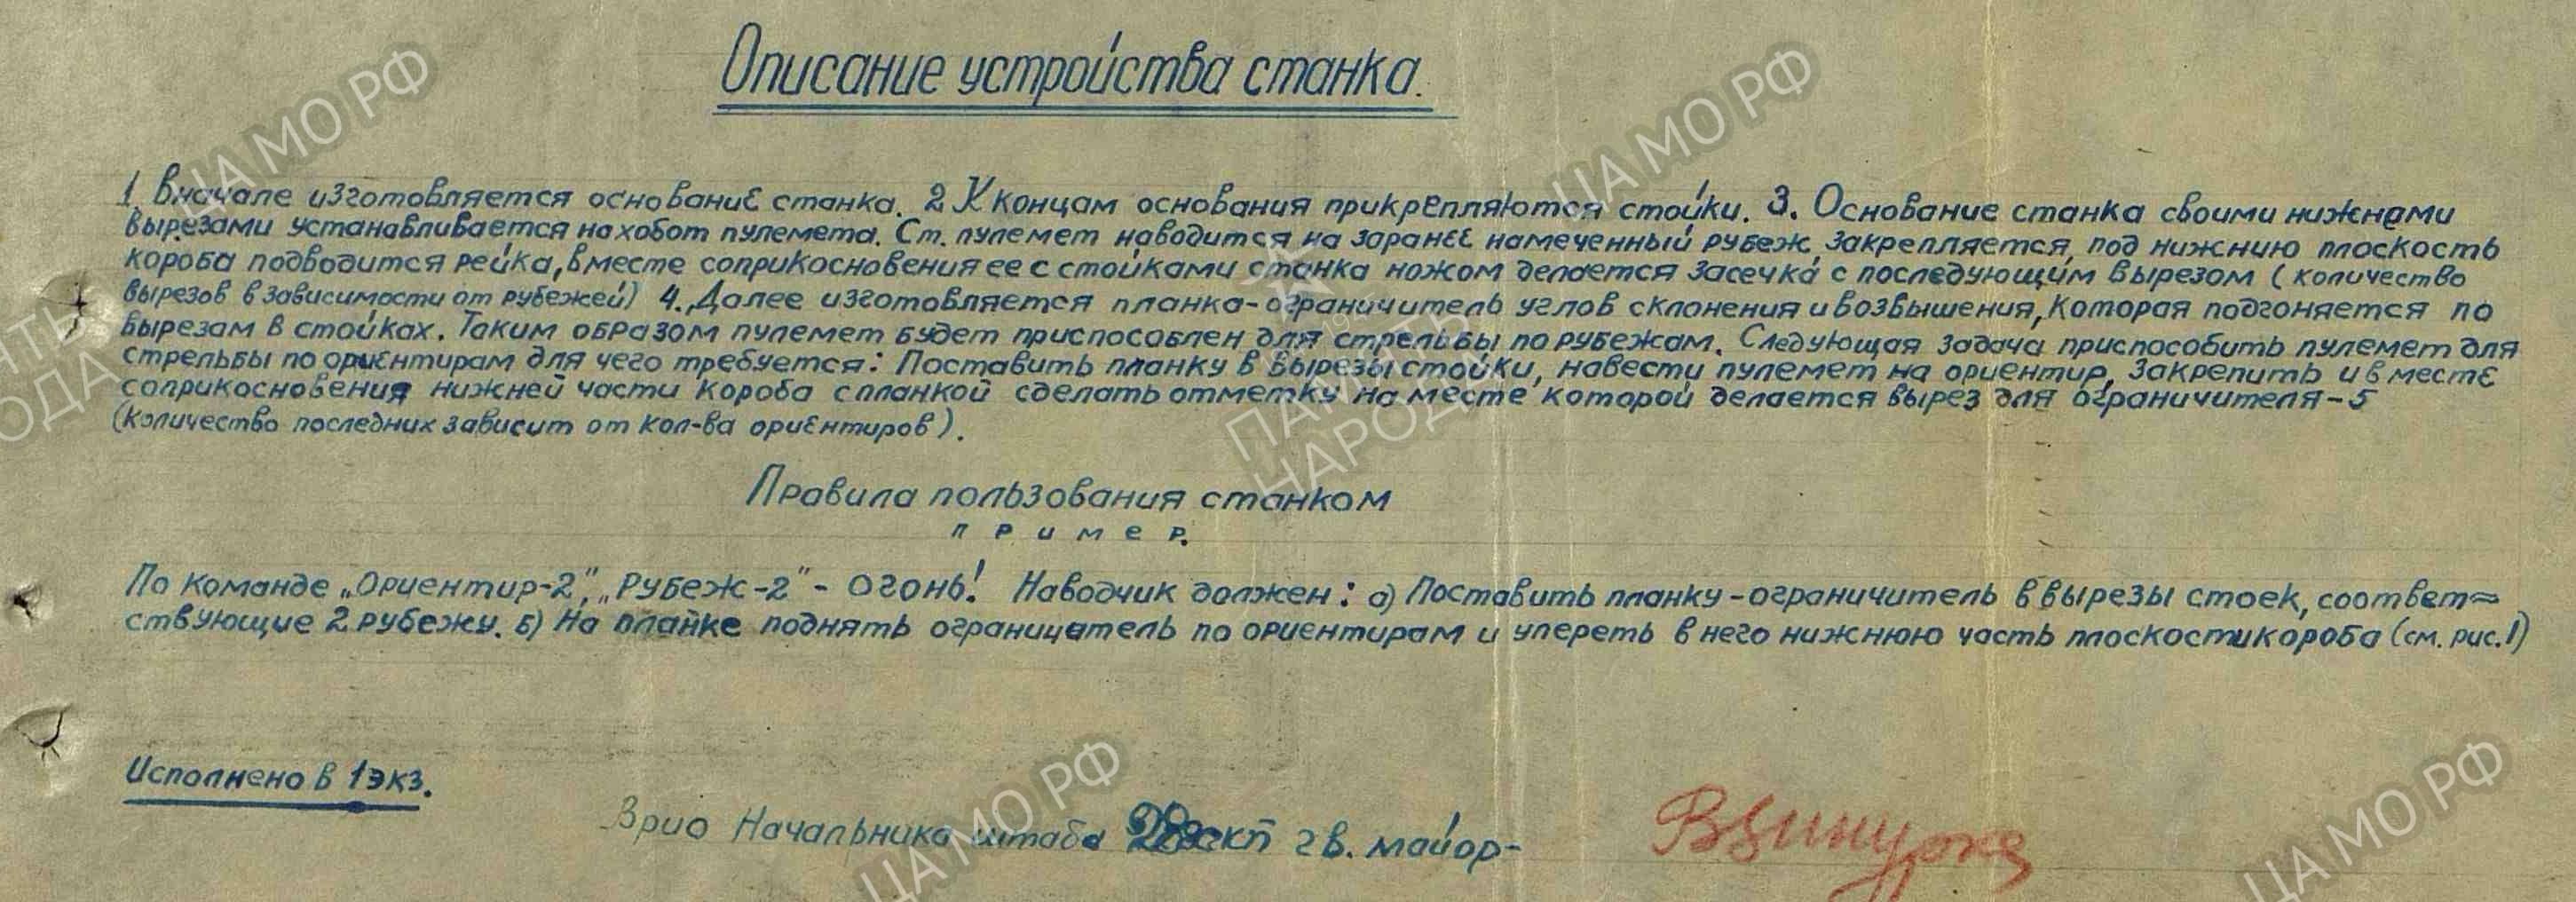 http://www.imageup.ru/img11/3211968/stanok-dlya-maksima1fr1.jpg